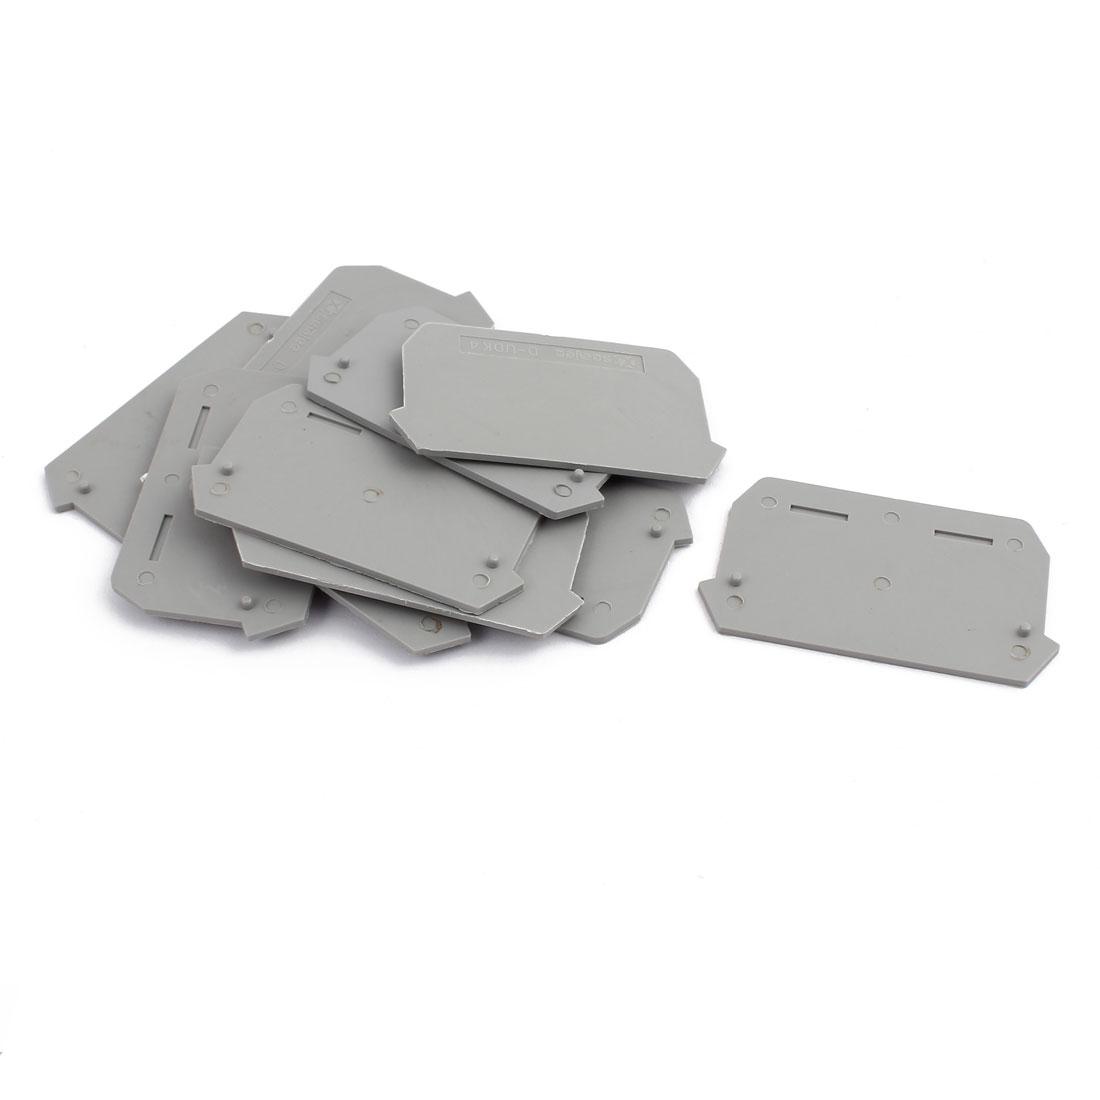 10Pcs D-UDK4 DIN Rail Terminal Block End Plate Covers Protectors Barriers